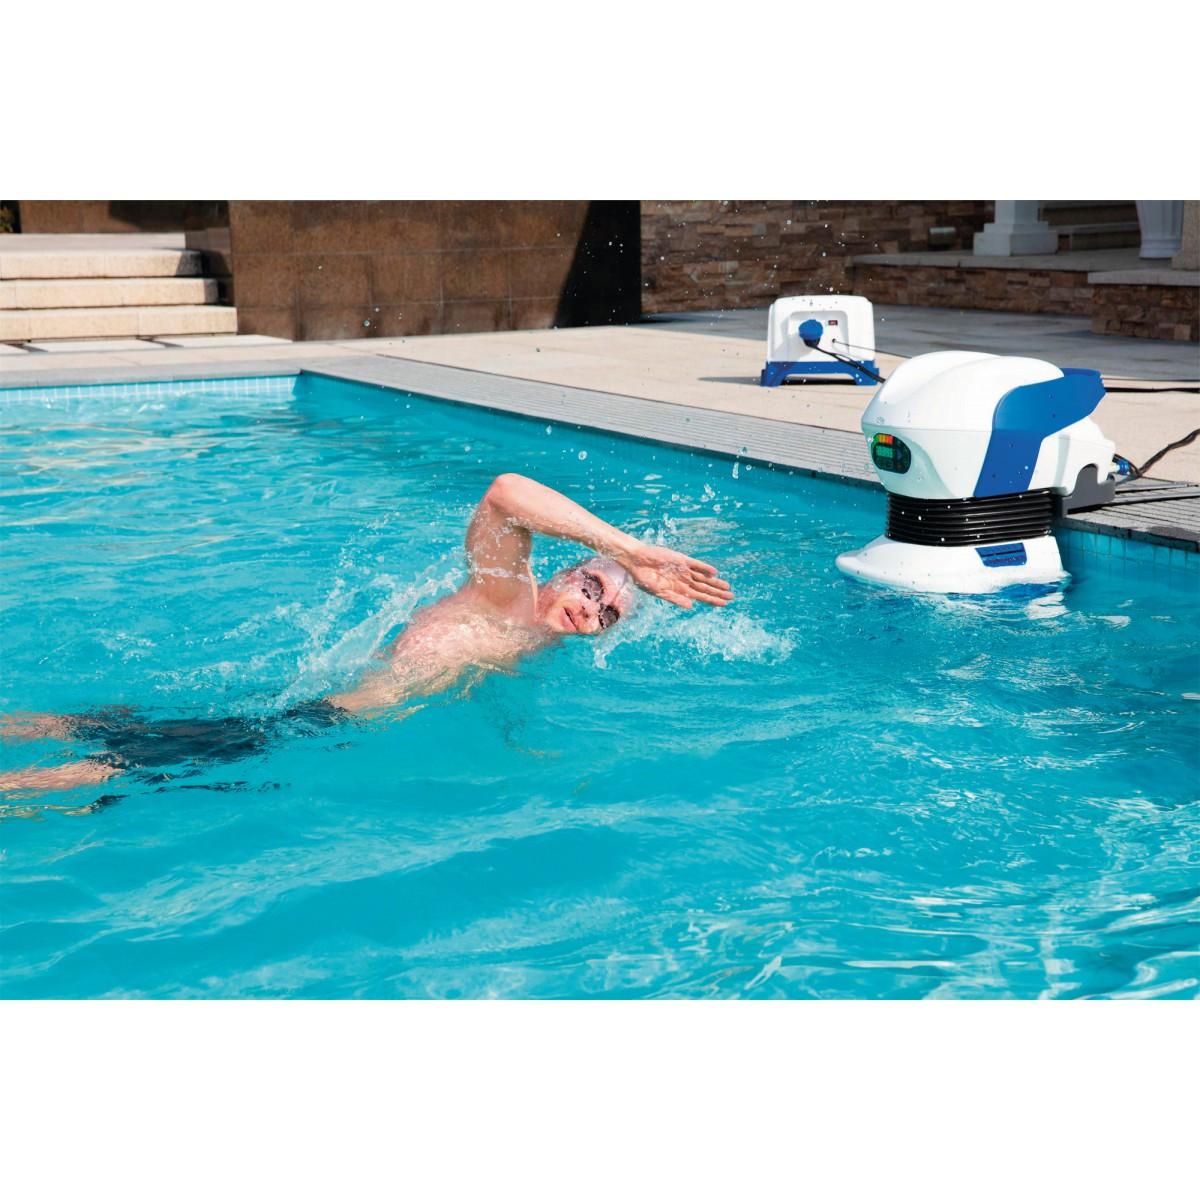 Nage à contre-courant Swimfinity Bestway - 1000 W